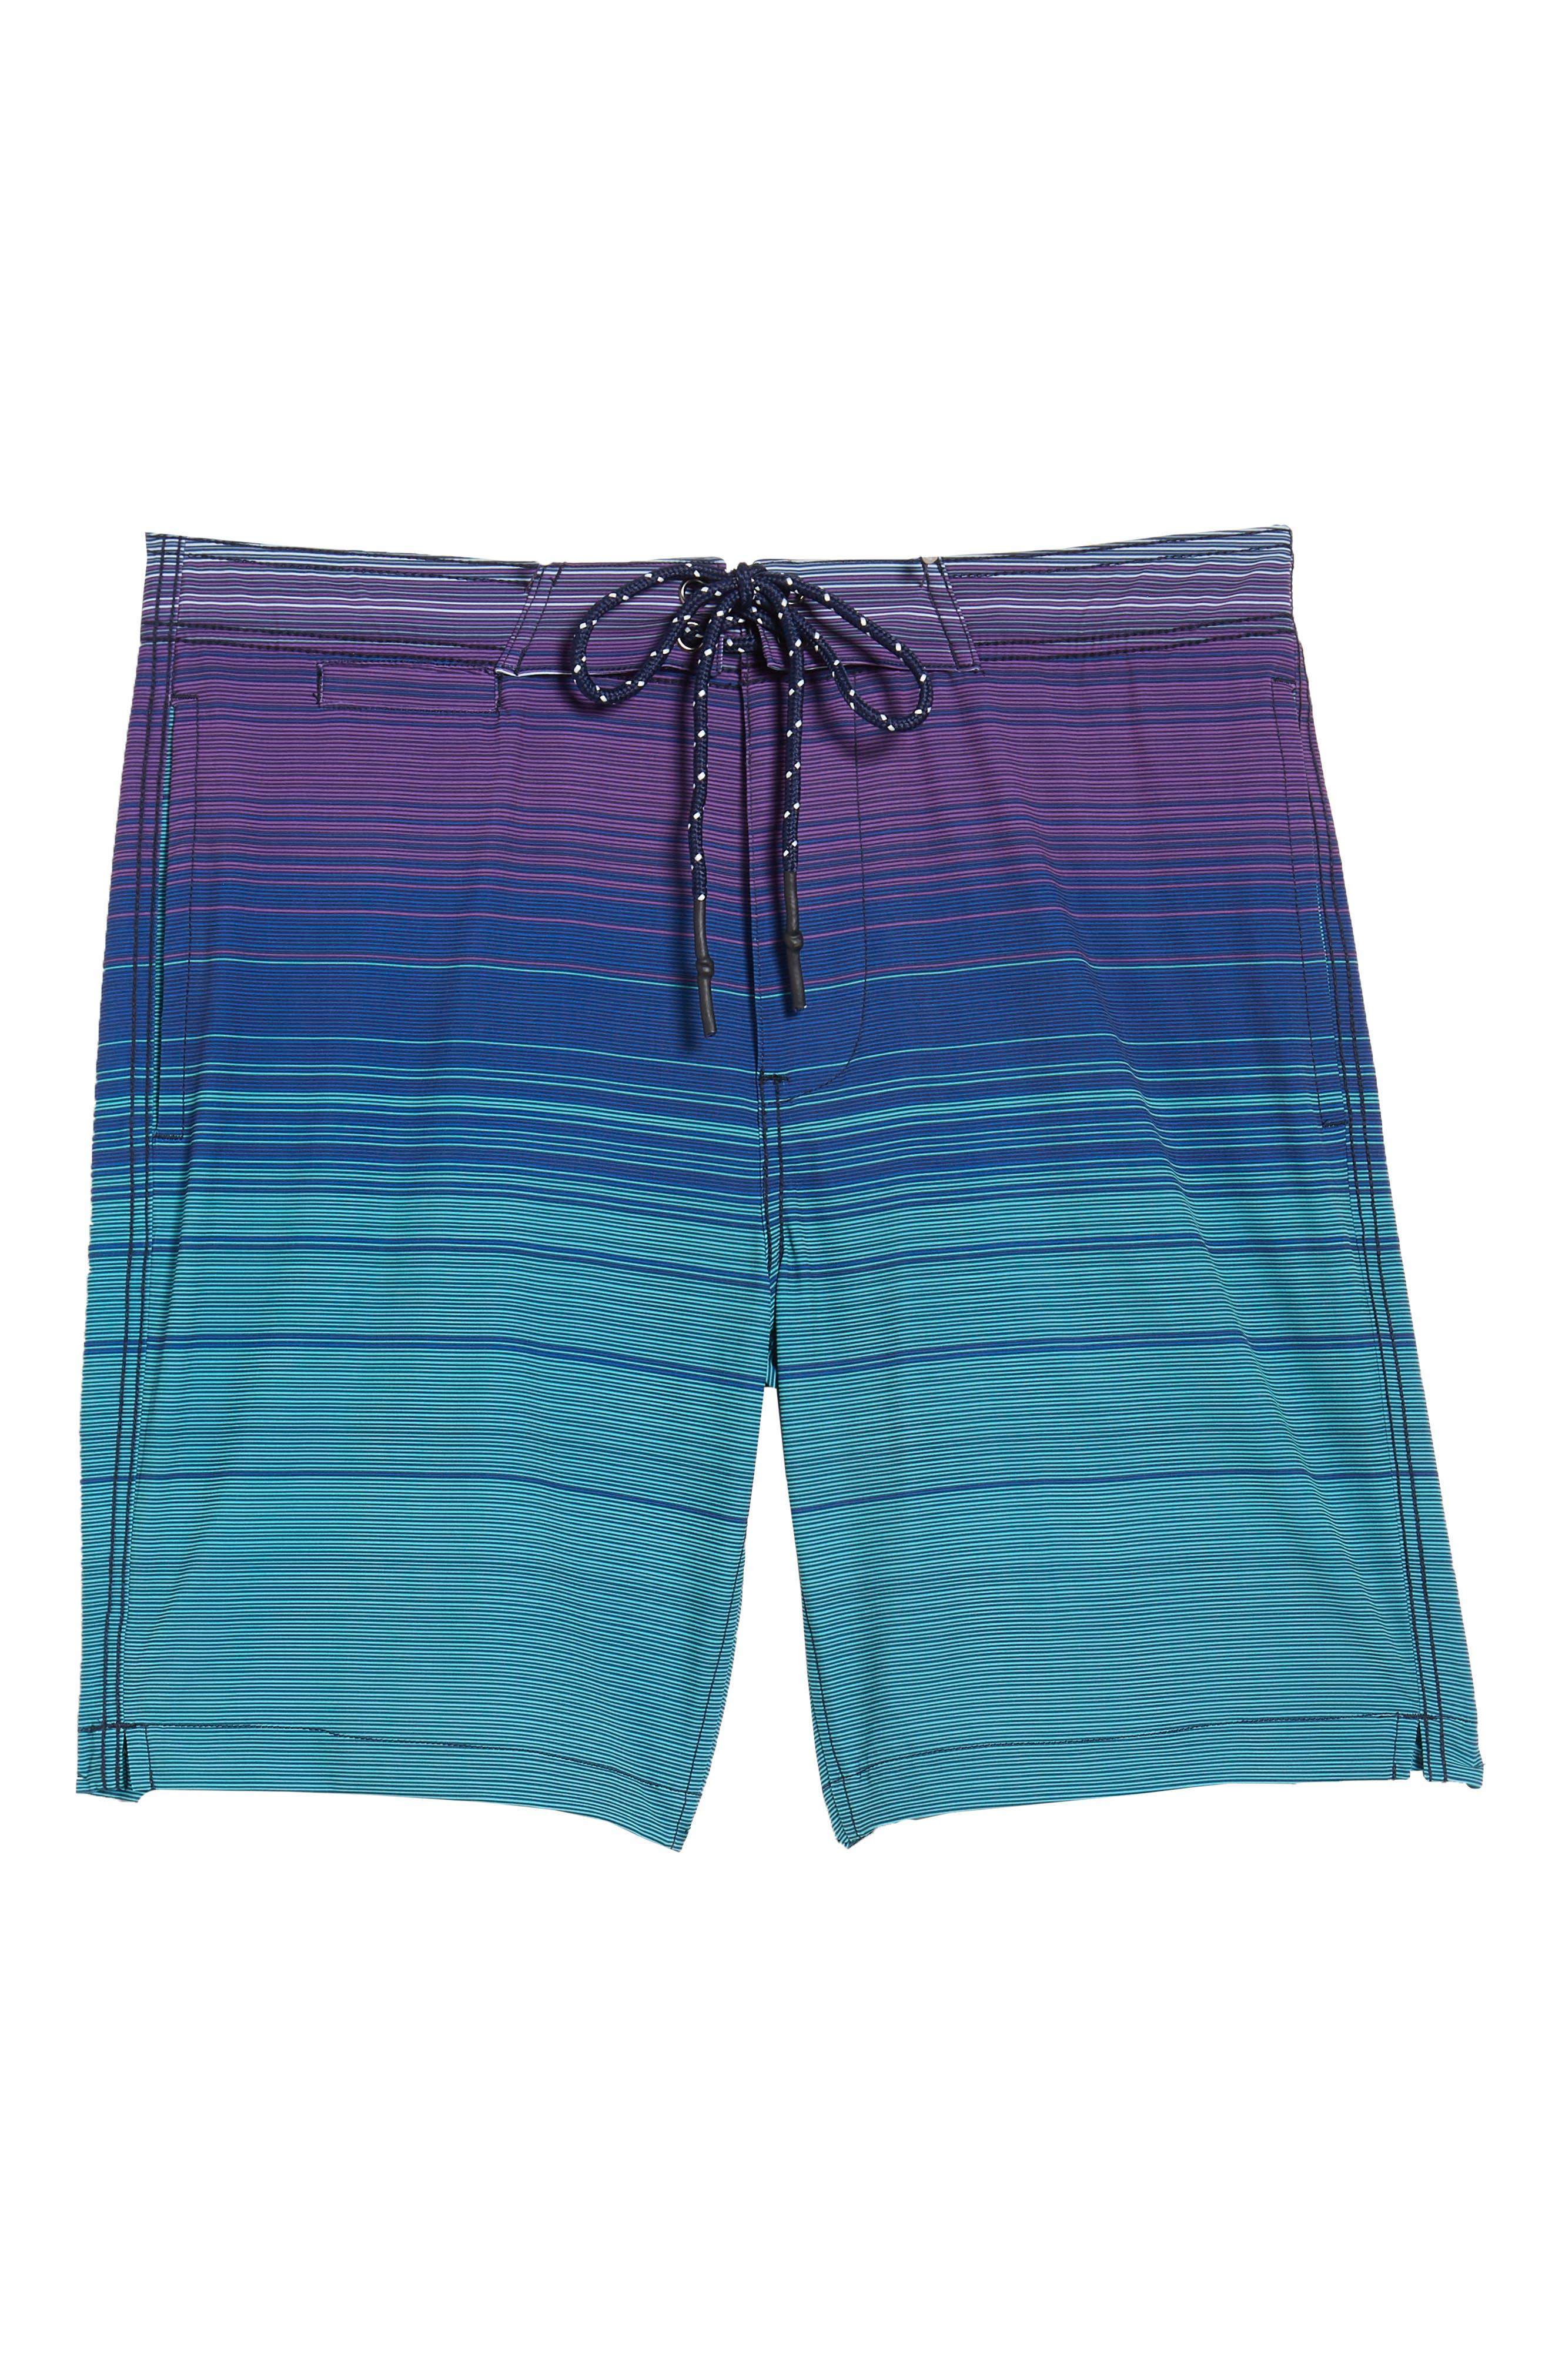 Ombré Stretch Stripe Board Shorts,                             Alternate thumbnail 6, color,                             Silver Pine